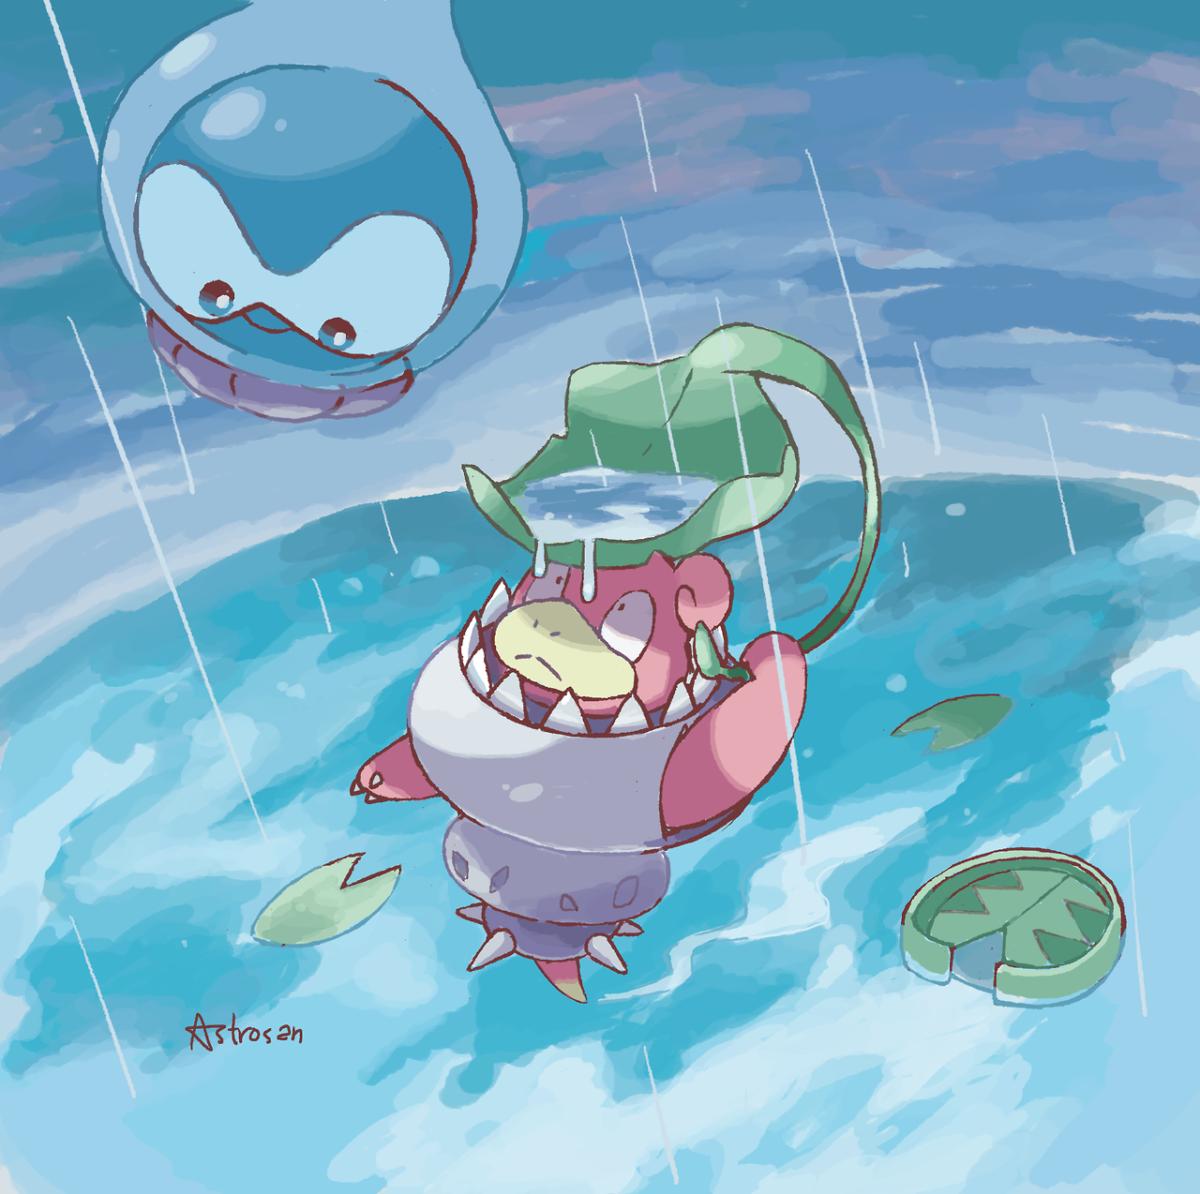 Mega Slowbro and Castform Fanart [Astrosan] : pokemon